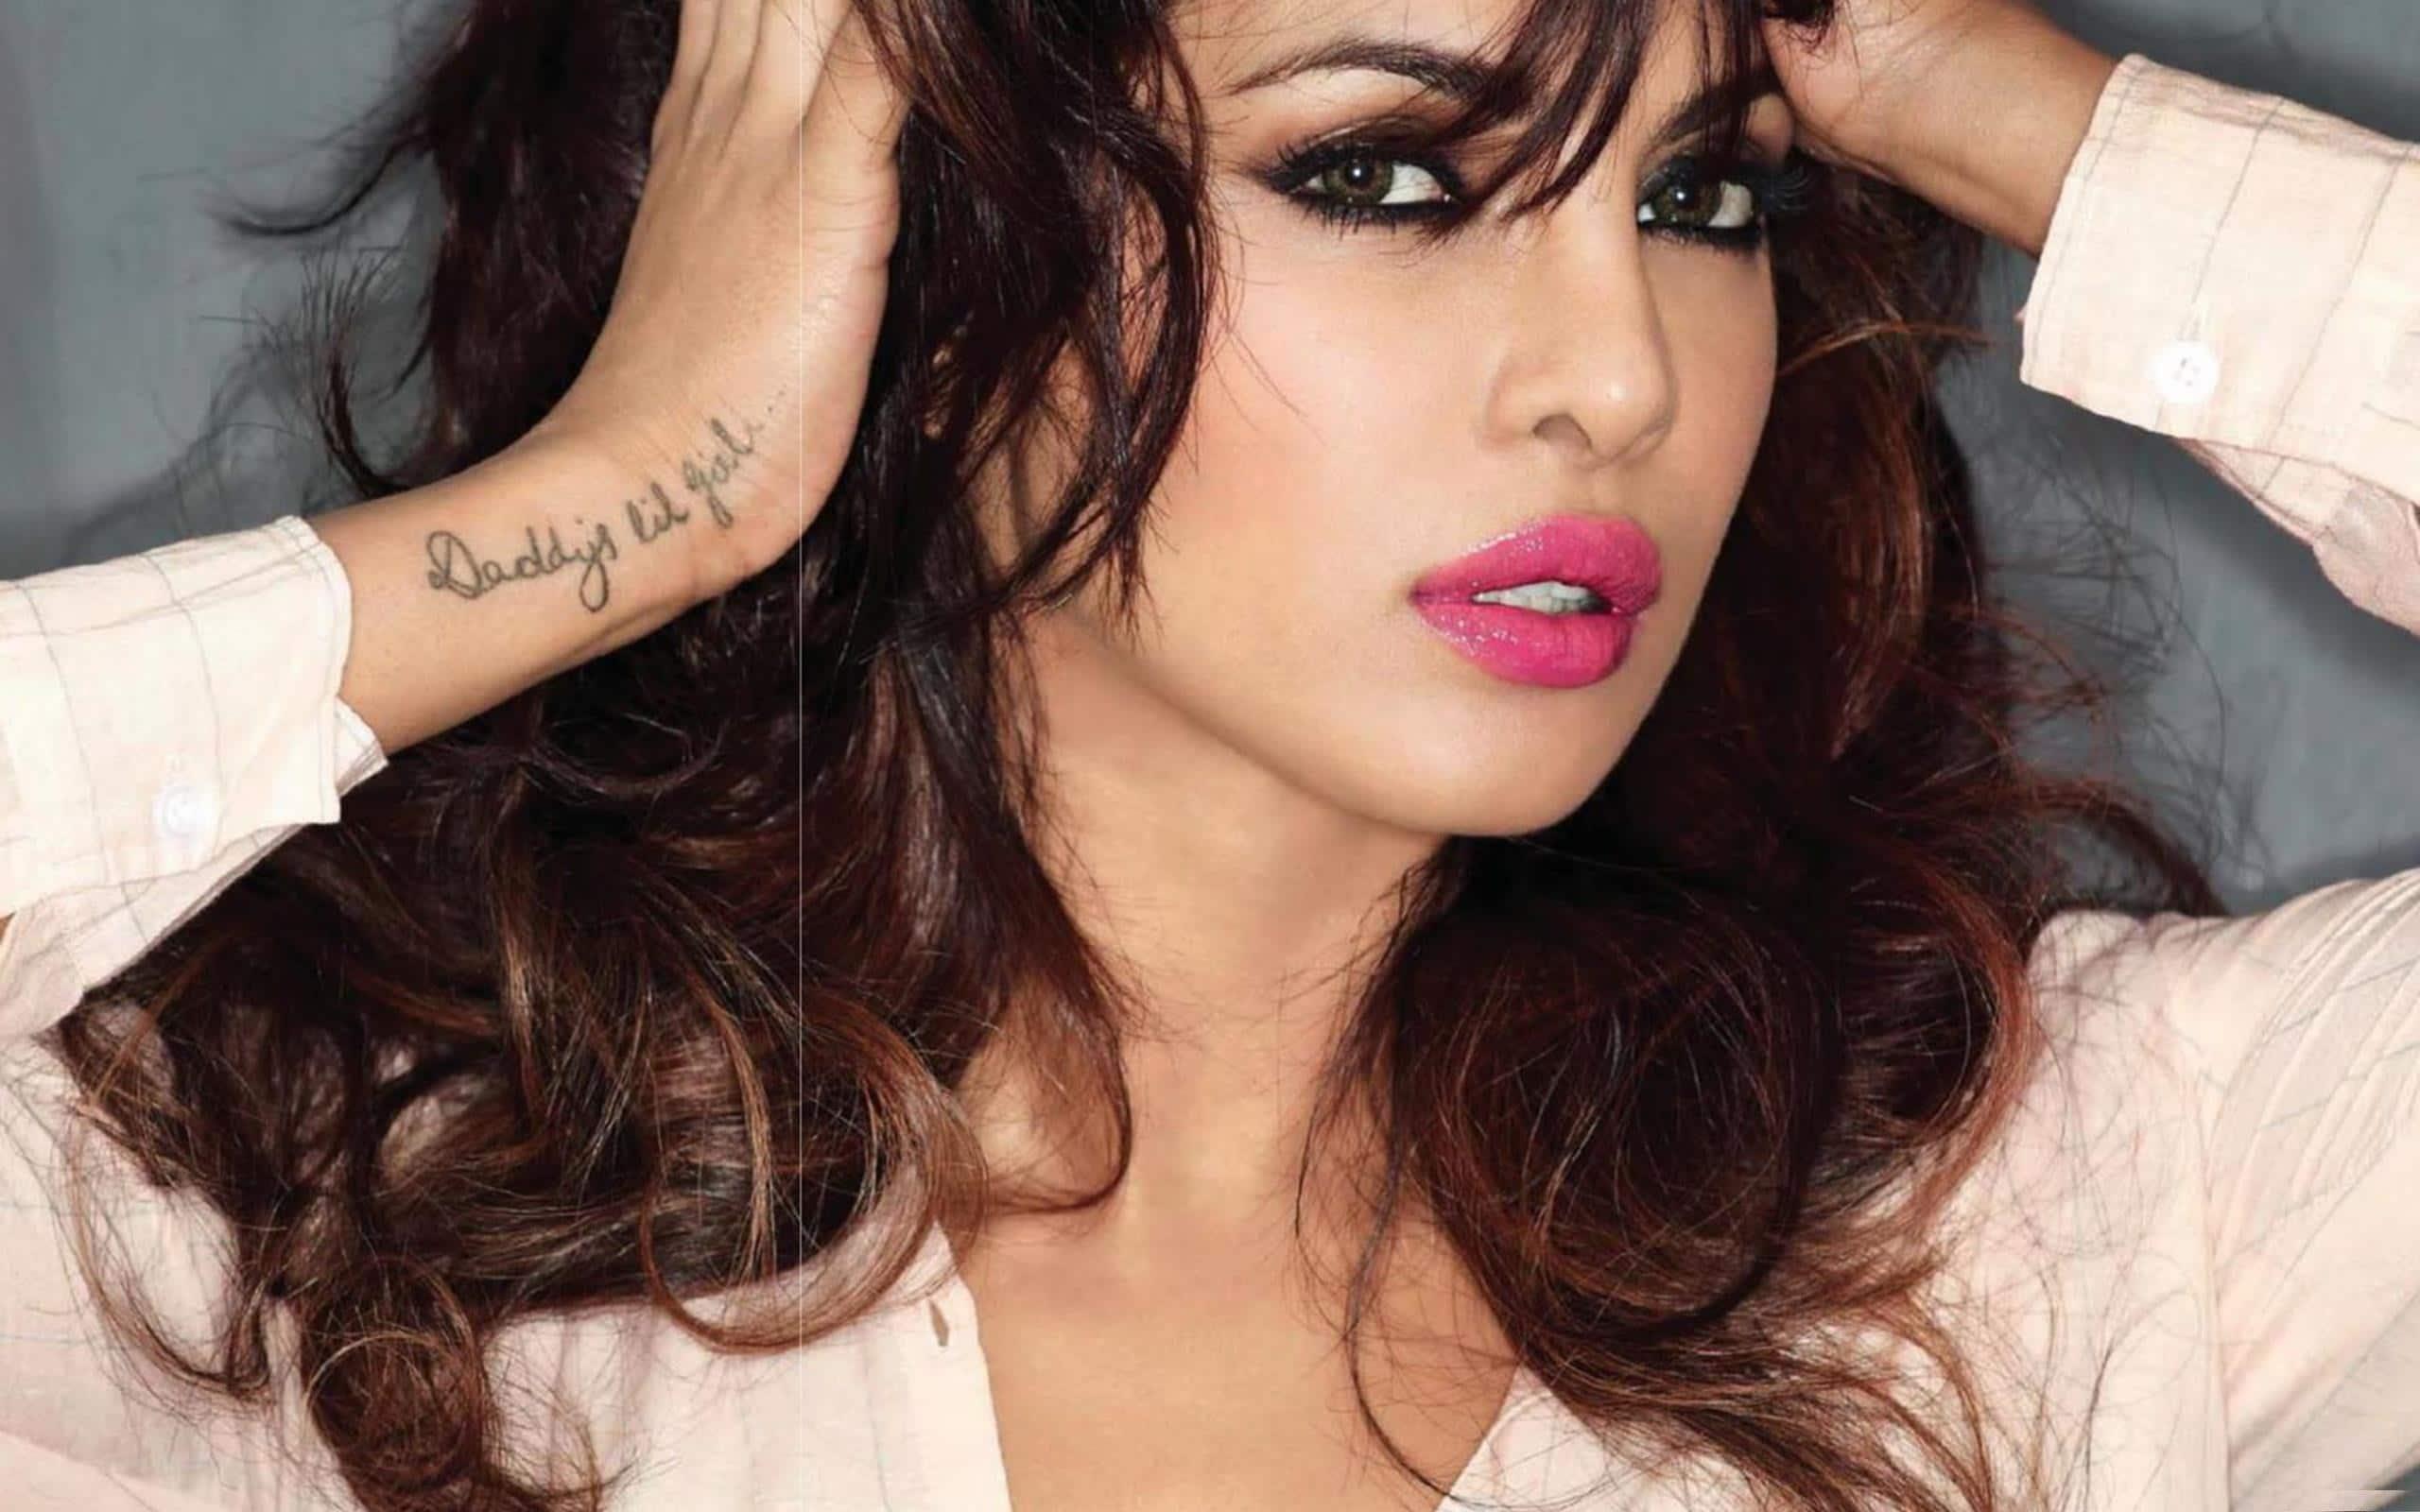 Rakeysh Omprakash Mehra's 'Fanney Khan' Will Star Priyanka Chopra?